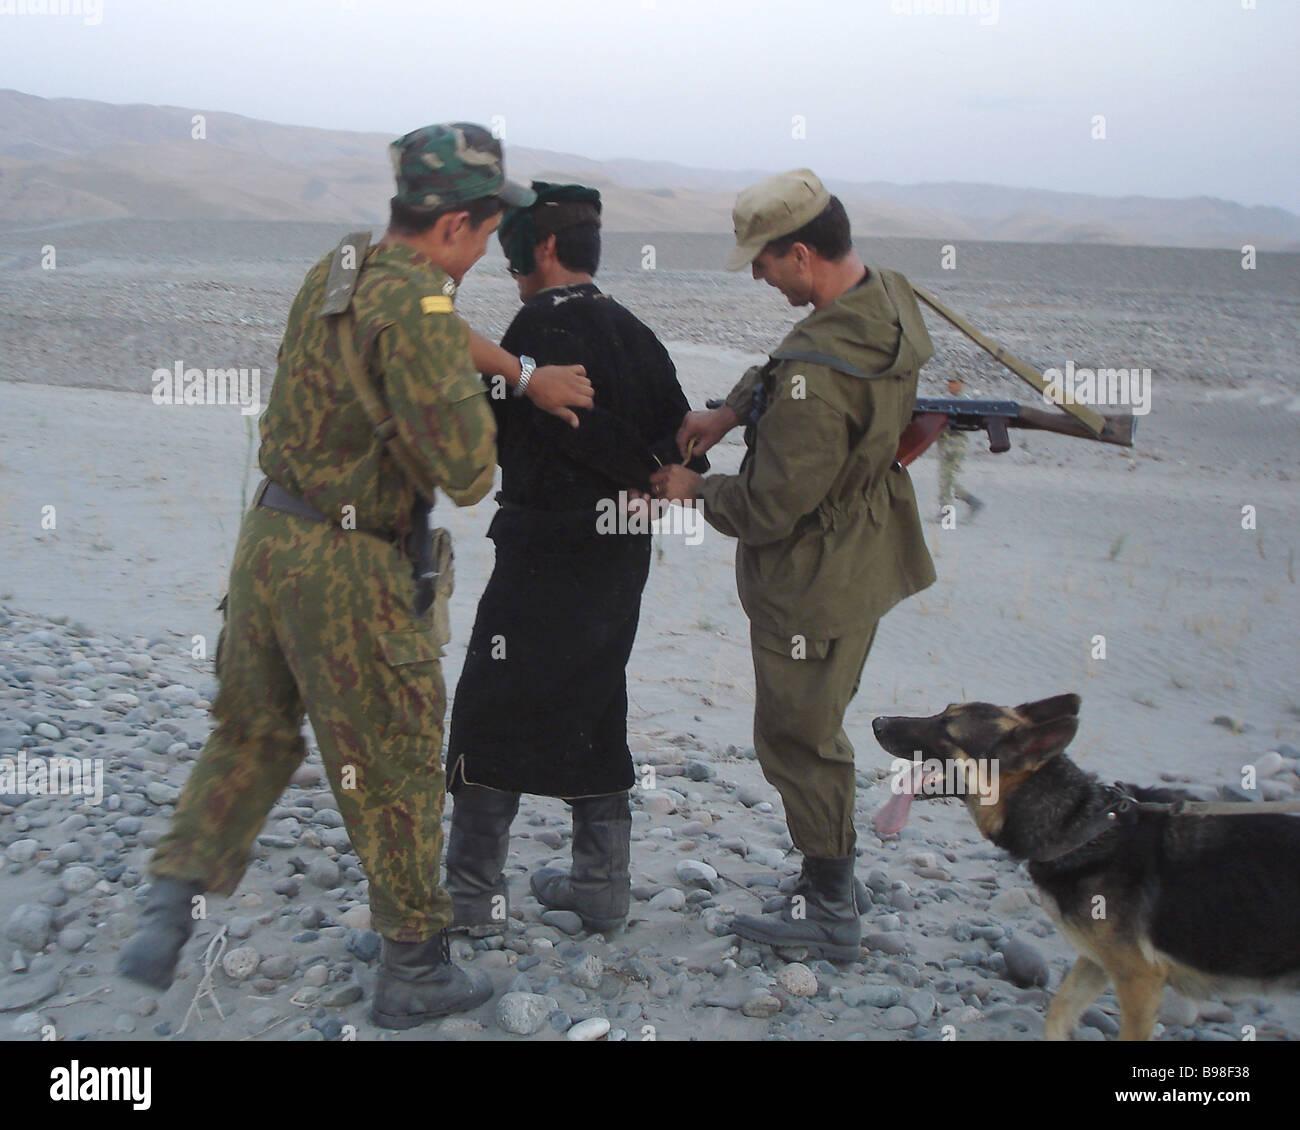 Detaining an Afghan drug smuggler on the Tajik Afghan border the area patrolling by the Pyandzhsky border guard - Stock Image